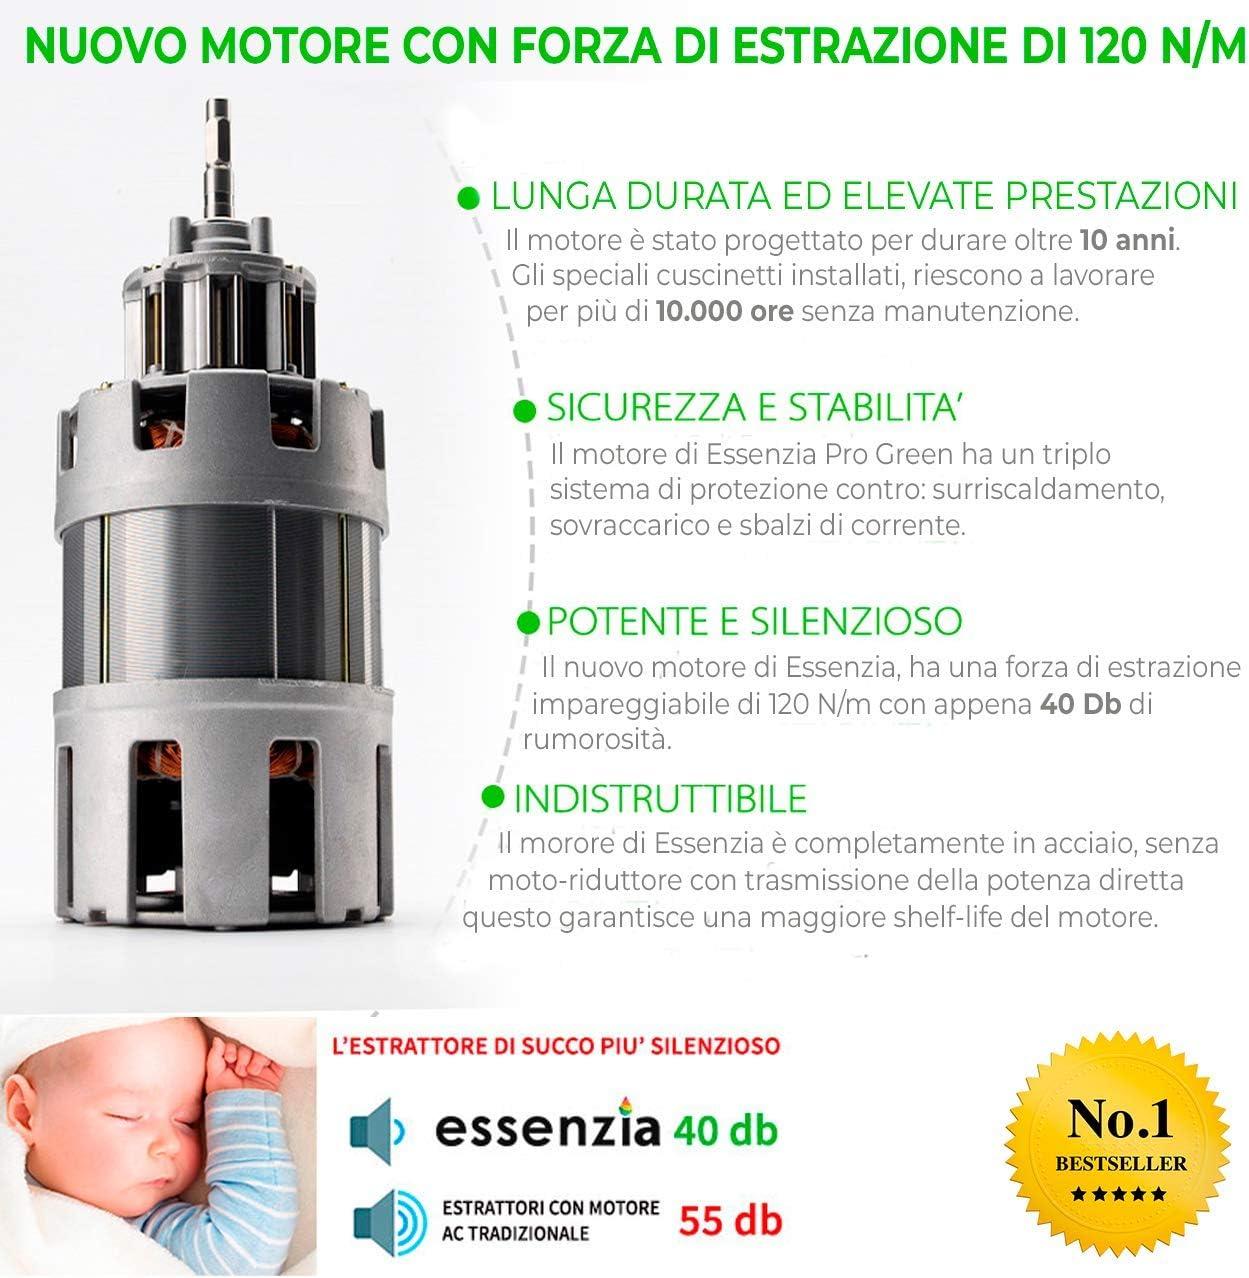 Extractor de zumo en frío Siquri Essenzia Pro Green 32 rpm ...